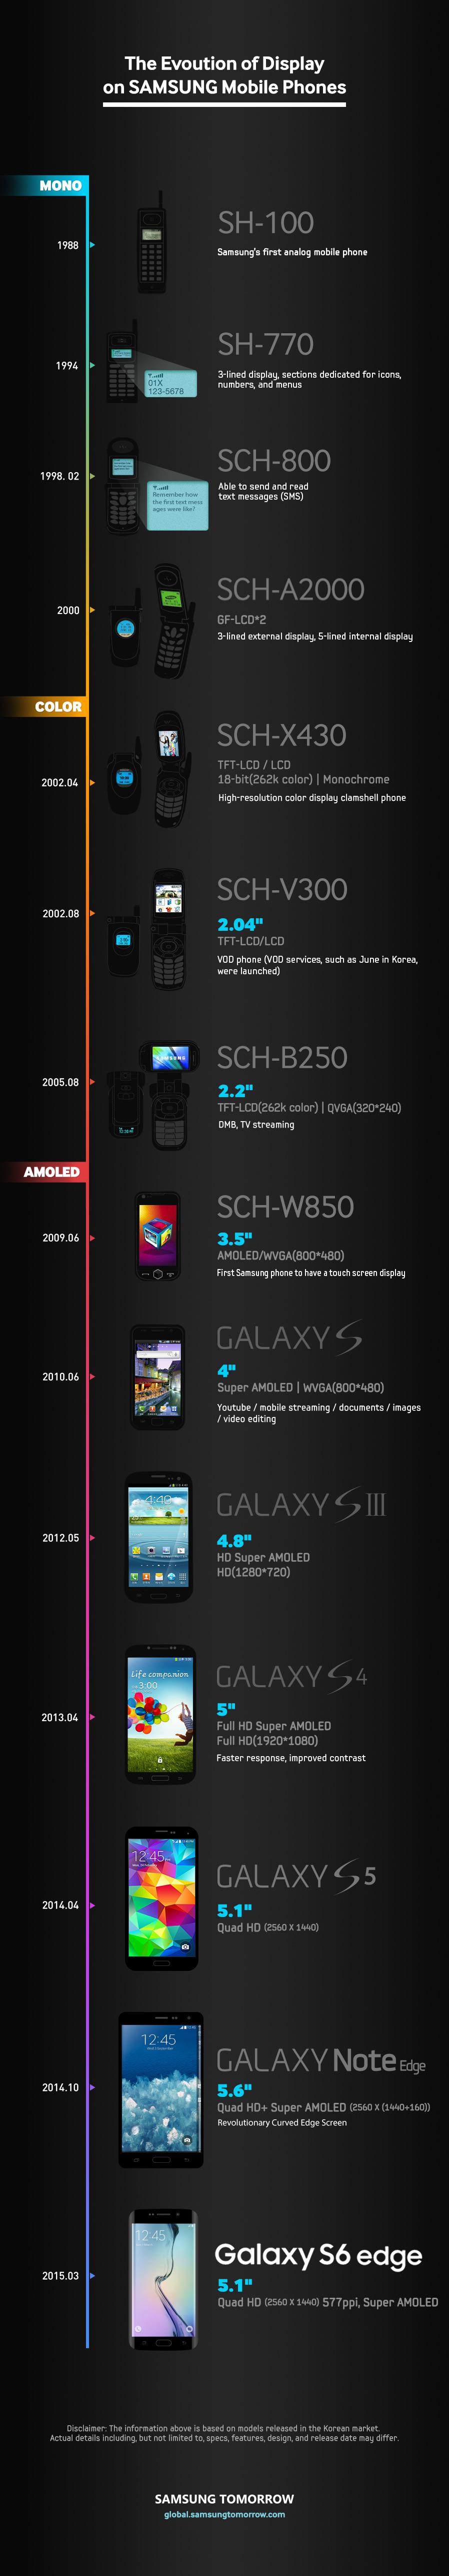 History-of-Smartphone_Display_info